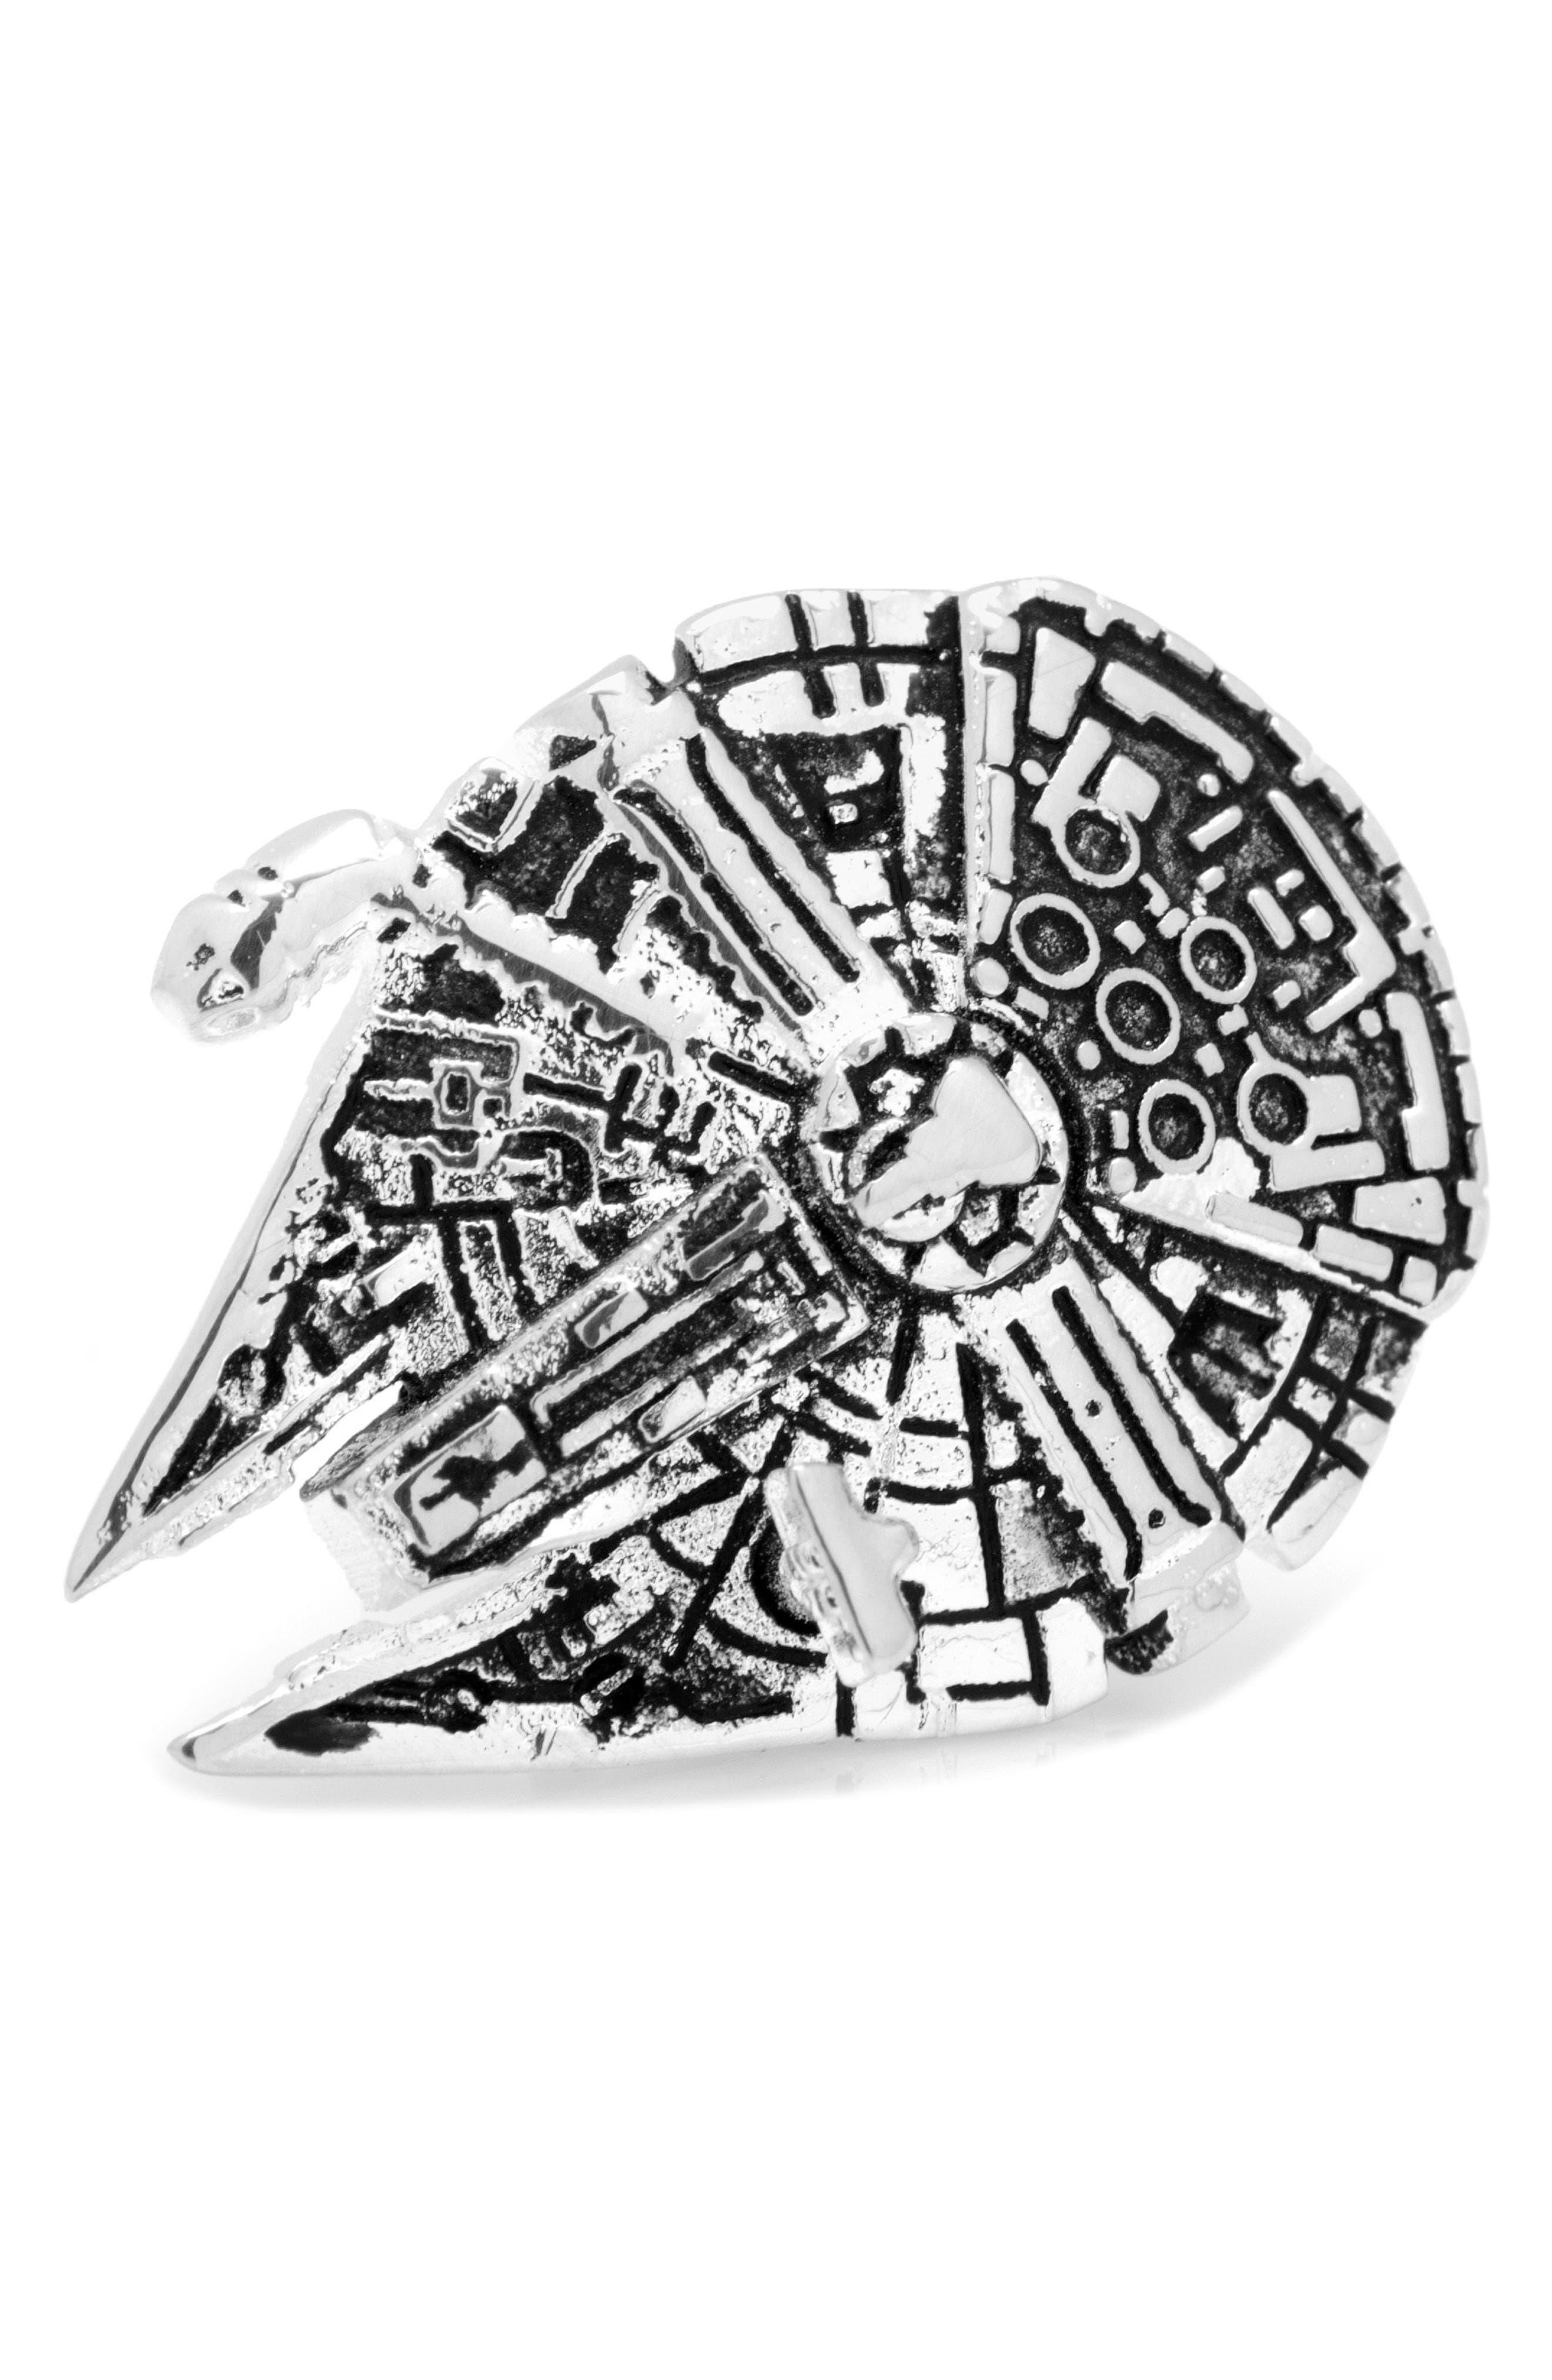 "Cufflinks Inc. ""Star Wars"" 3D Millennium Falcon Lapel Pin,                             Main thumbnail 1, color,                             SILVER"